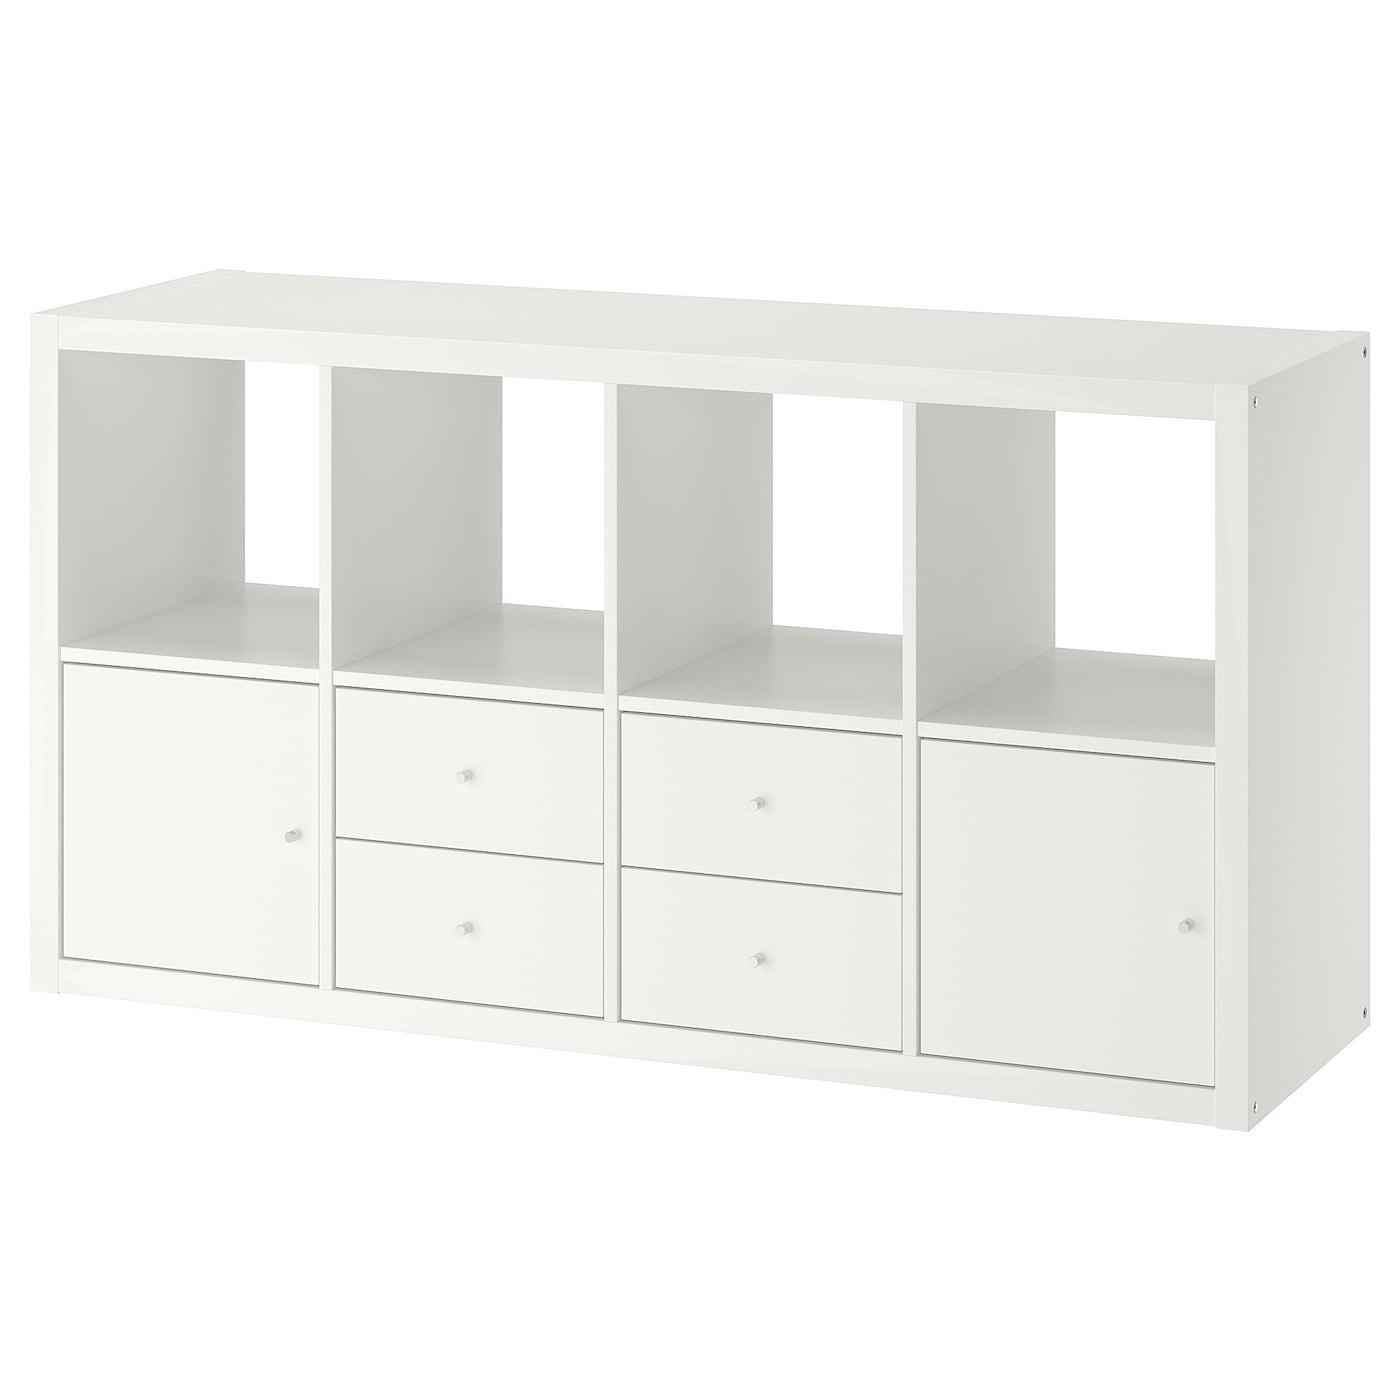 KALLAX Regal weiß IKEA Deutschland in 2020 | Ikea room